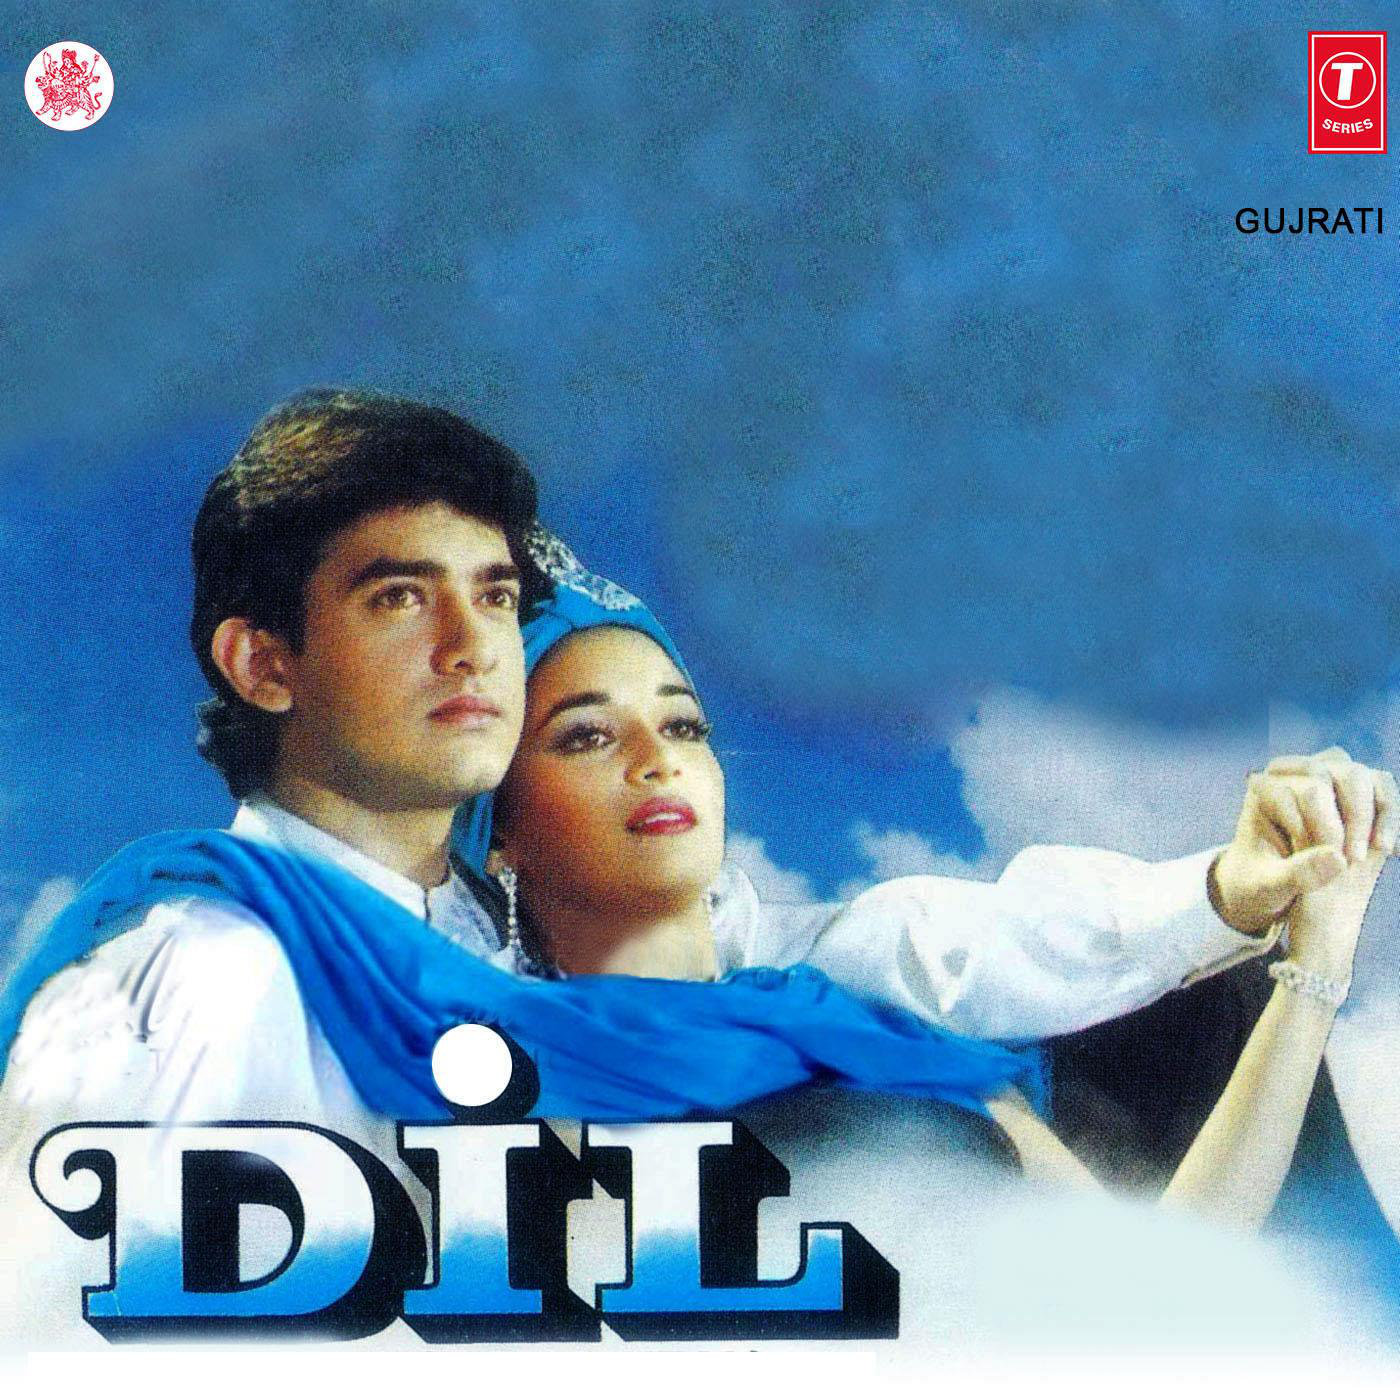 Download Lagu Ost Dil Se Dil Tak: Dil Original Motion Picture Soundtrack